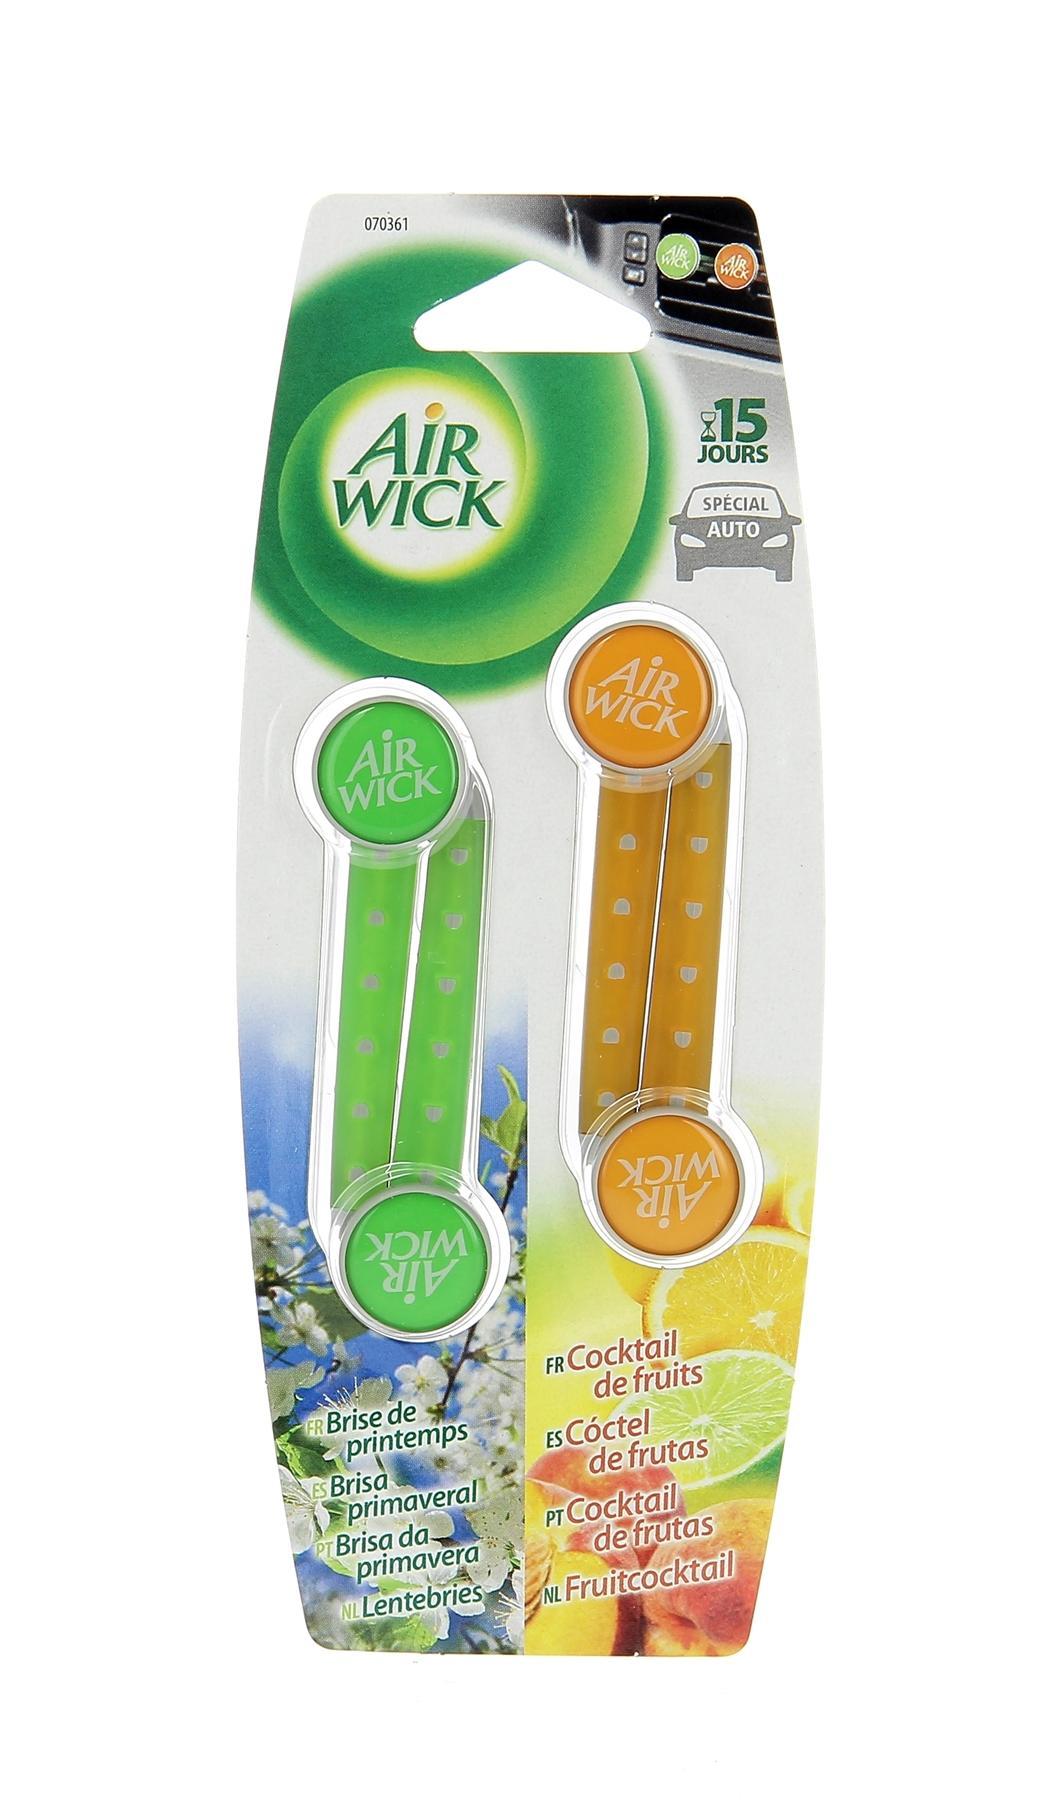 Lufterfrischer AIR WICK 070361 Erfahrung